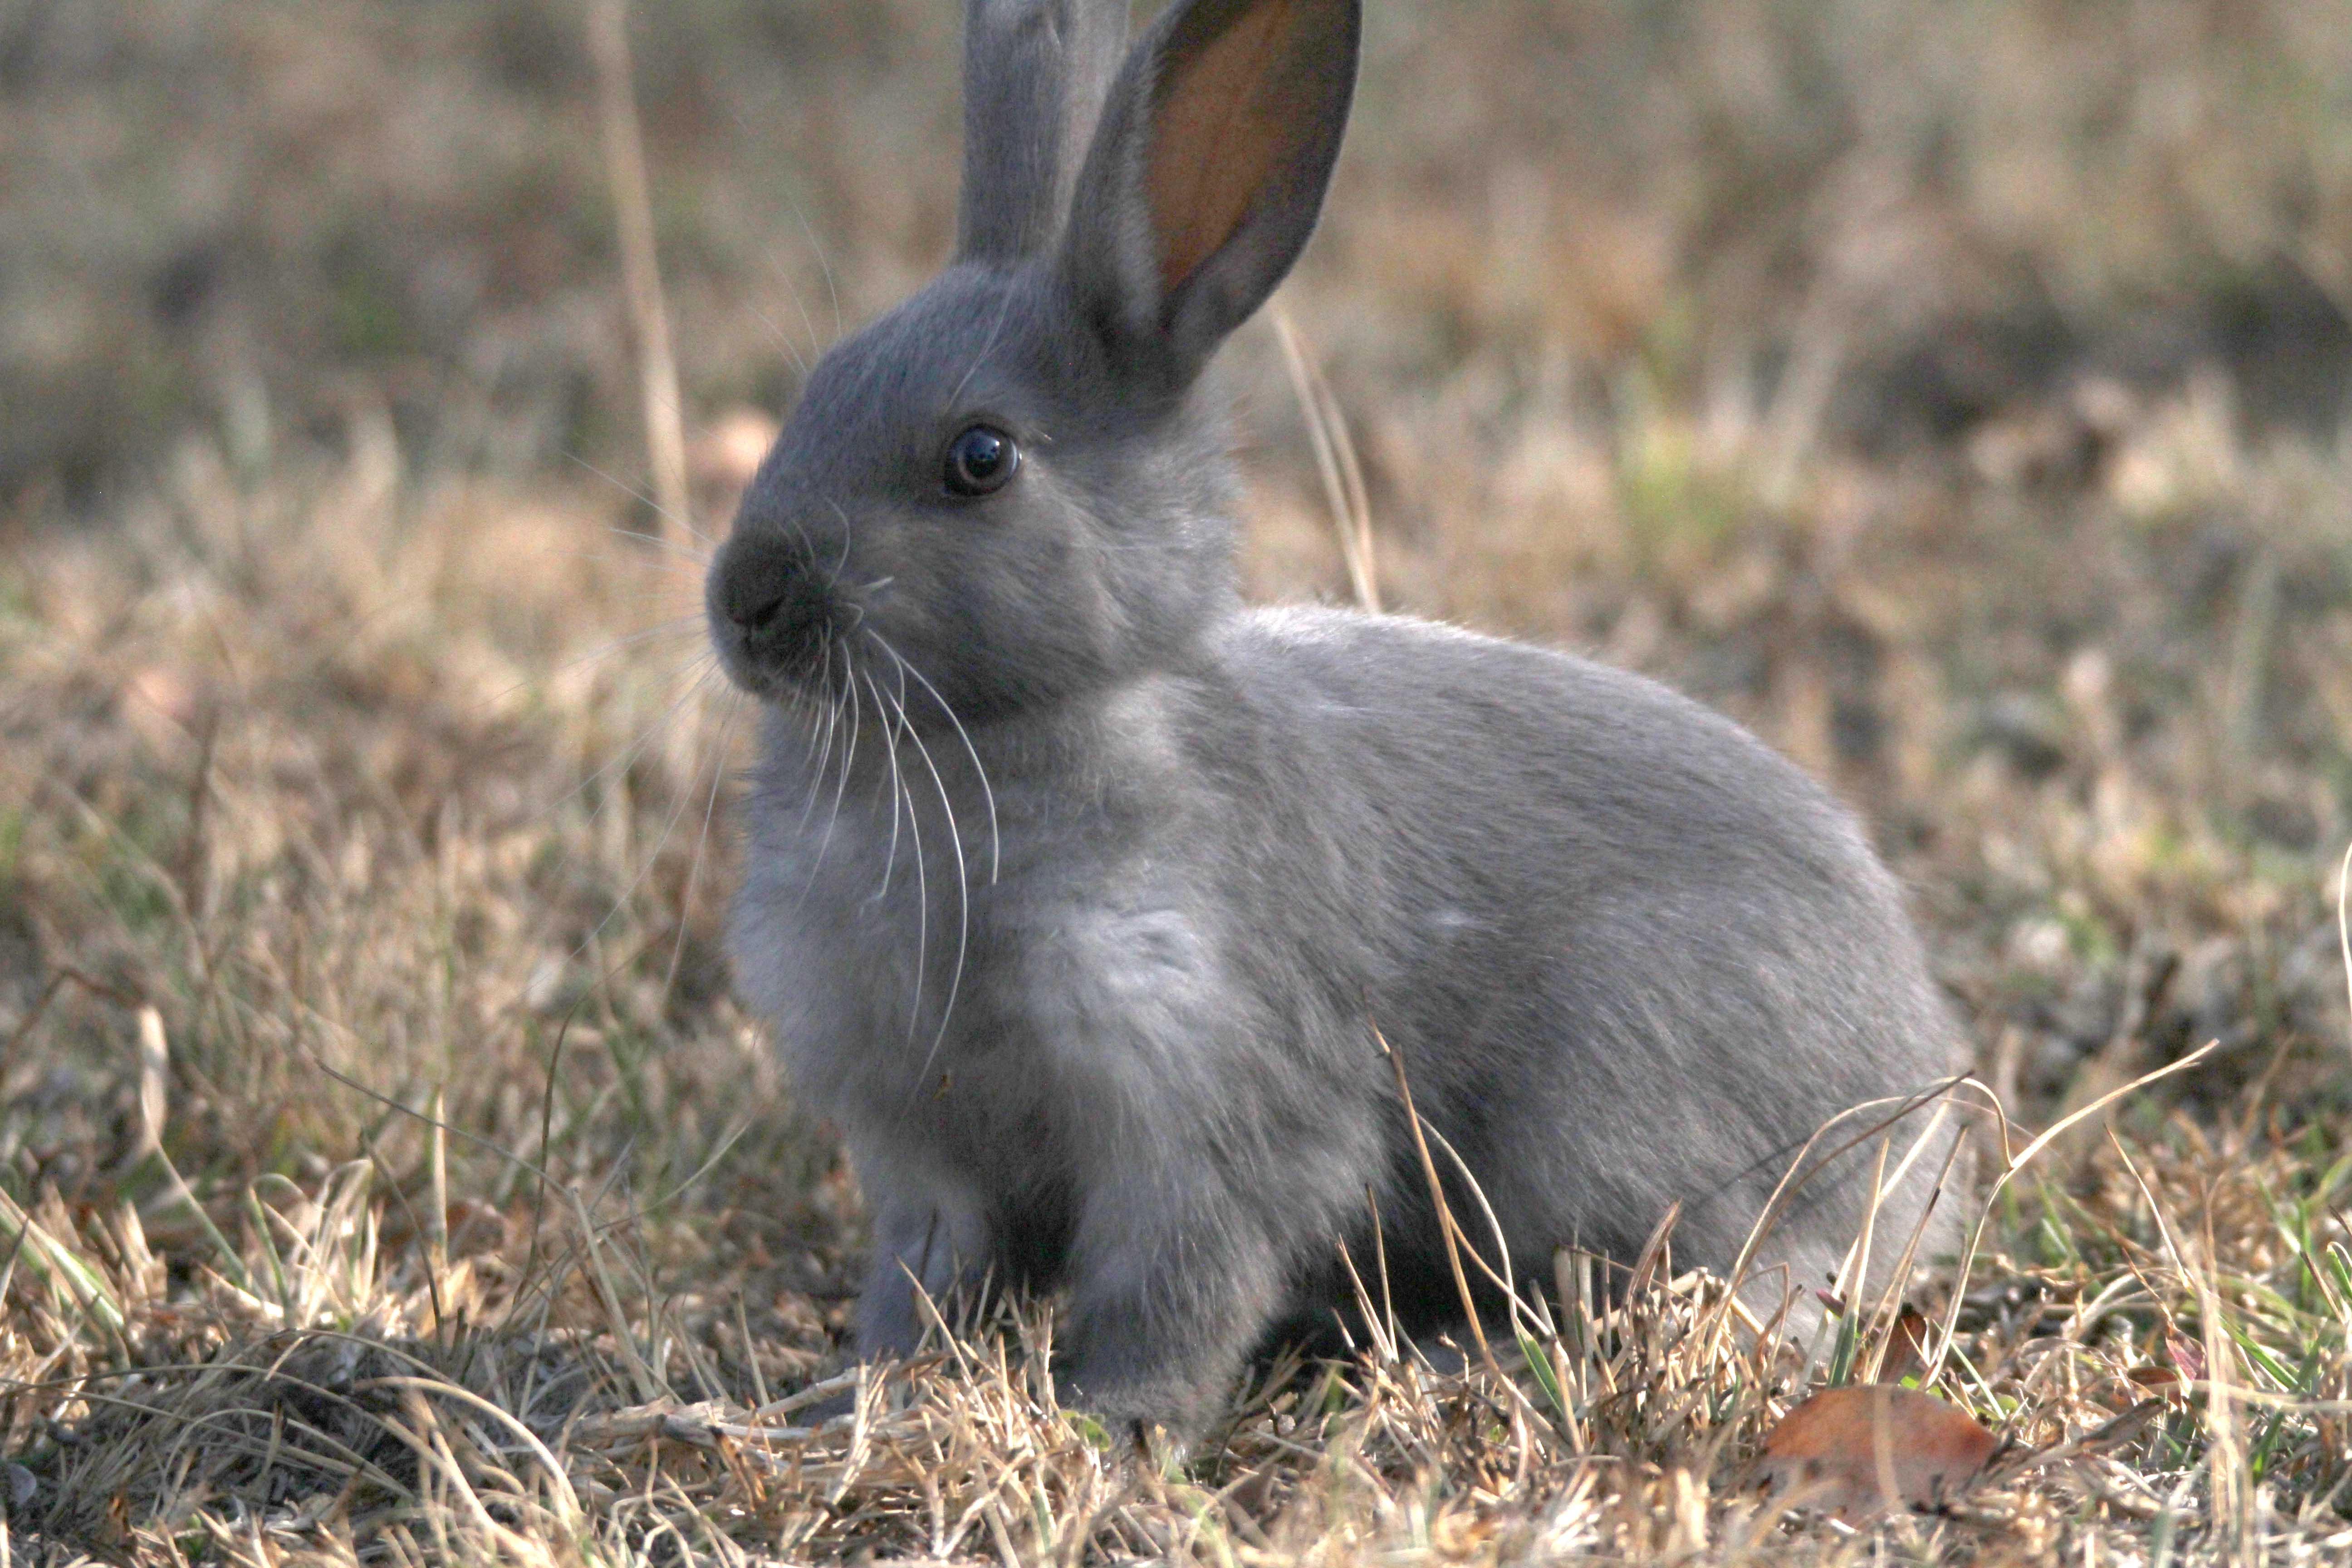 update thousands of benoni rabbits to become food at zoo benoni